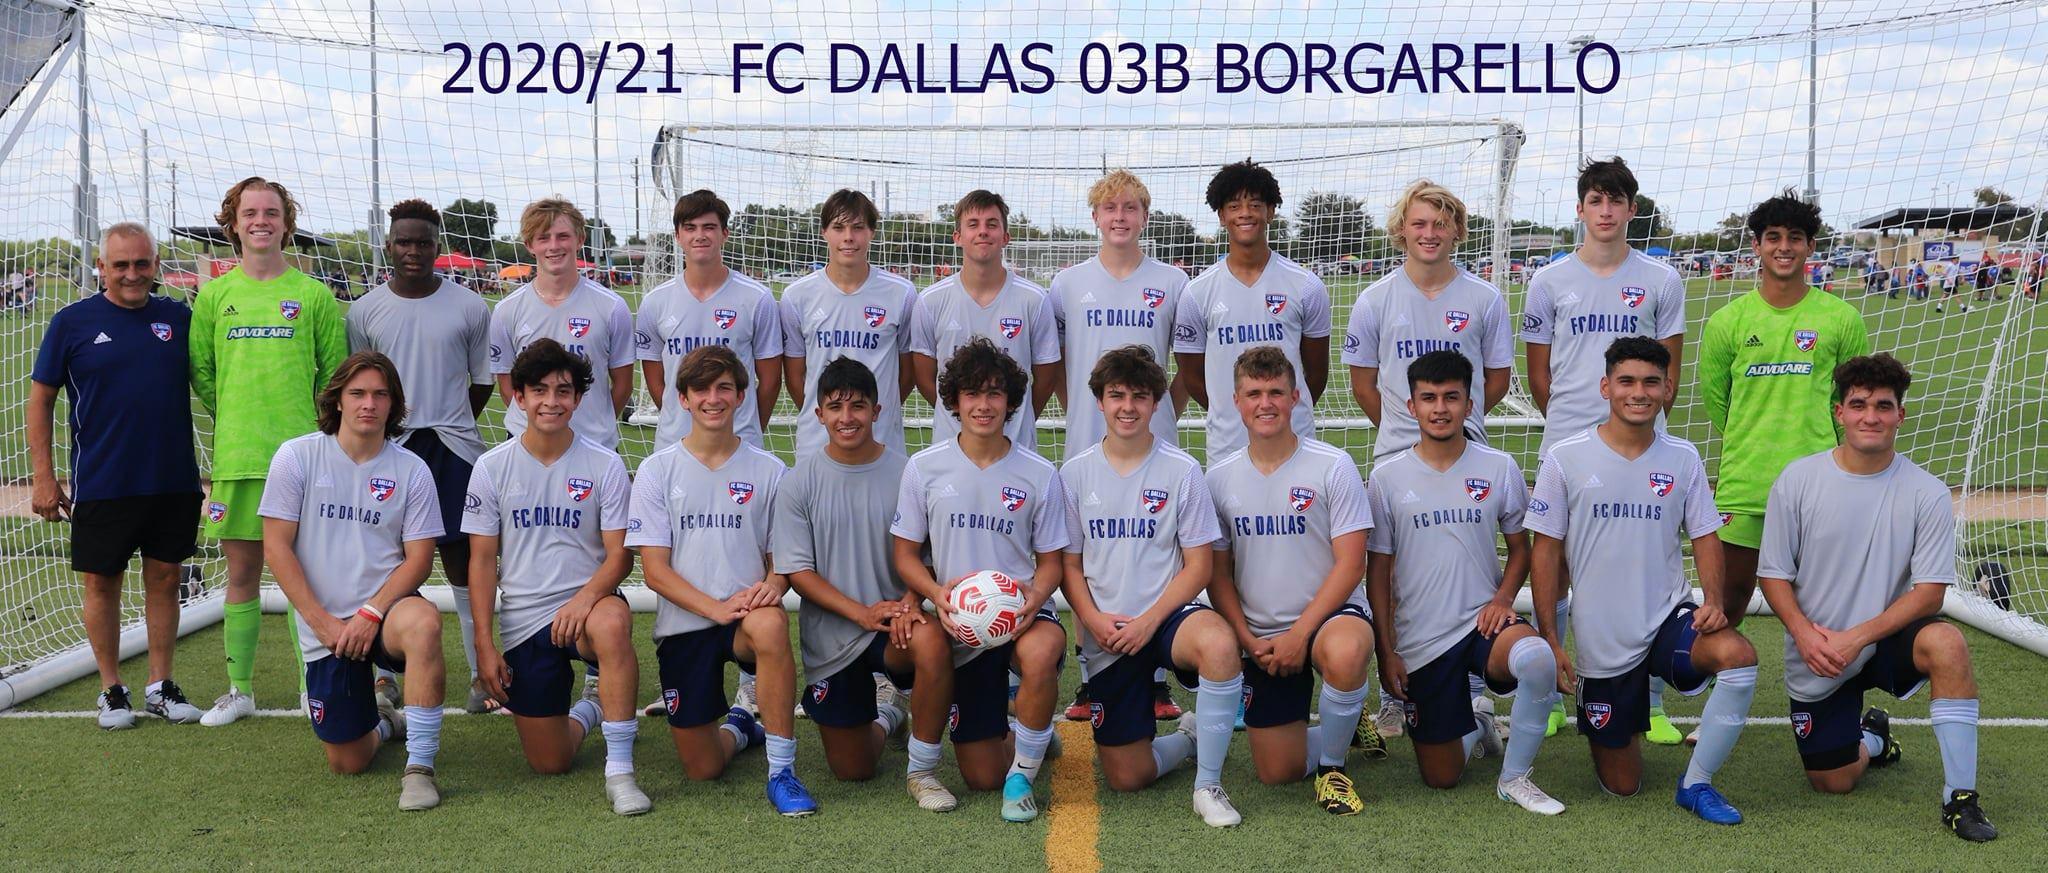 FCD 03 boys